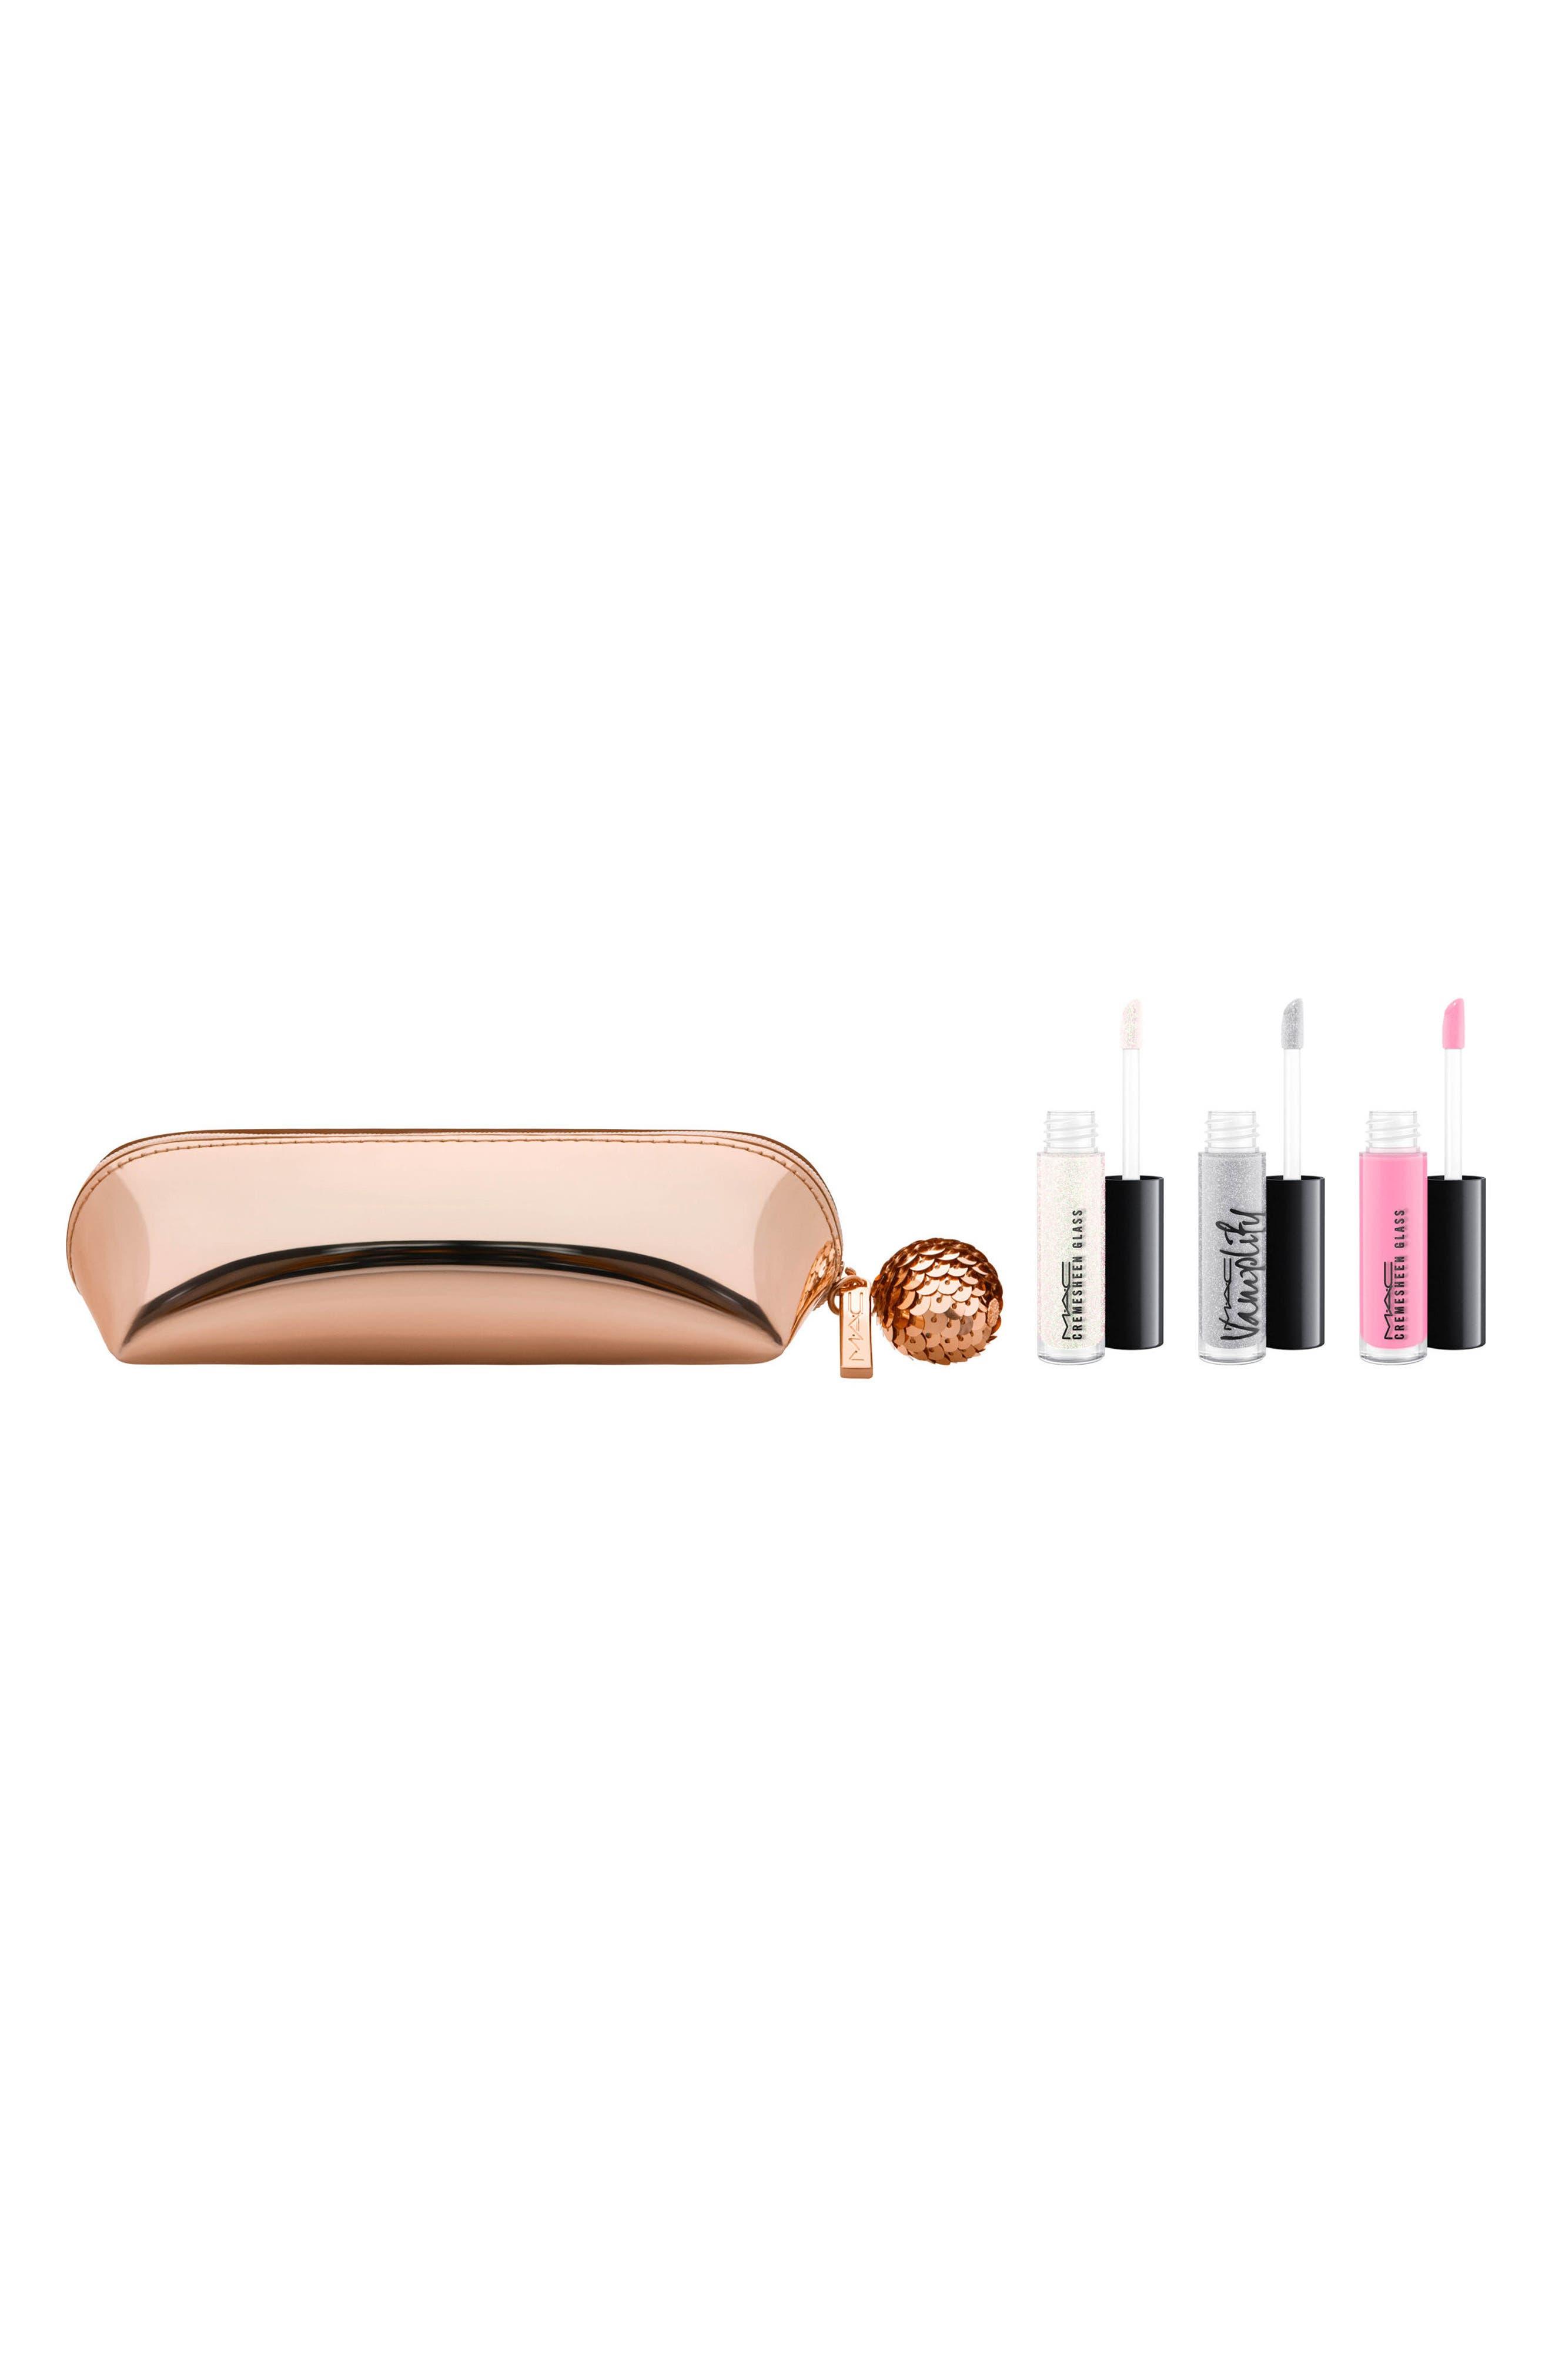 Alternate Image 1 Selected - MAC Snow Ball Pink Mini Lip Gloss Kit ($68 Value)